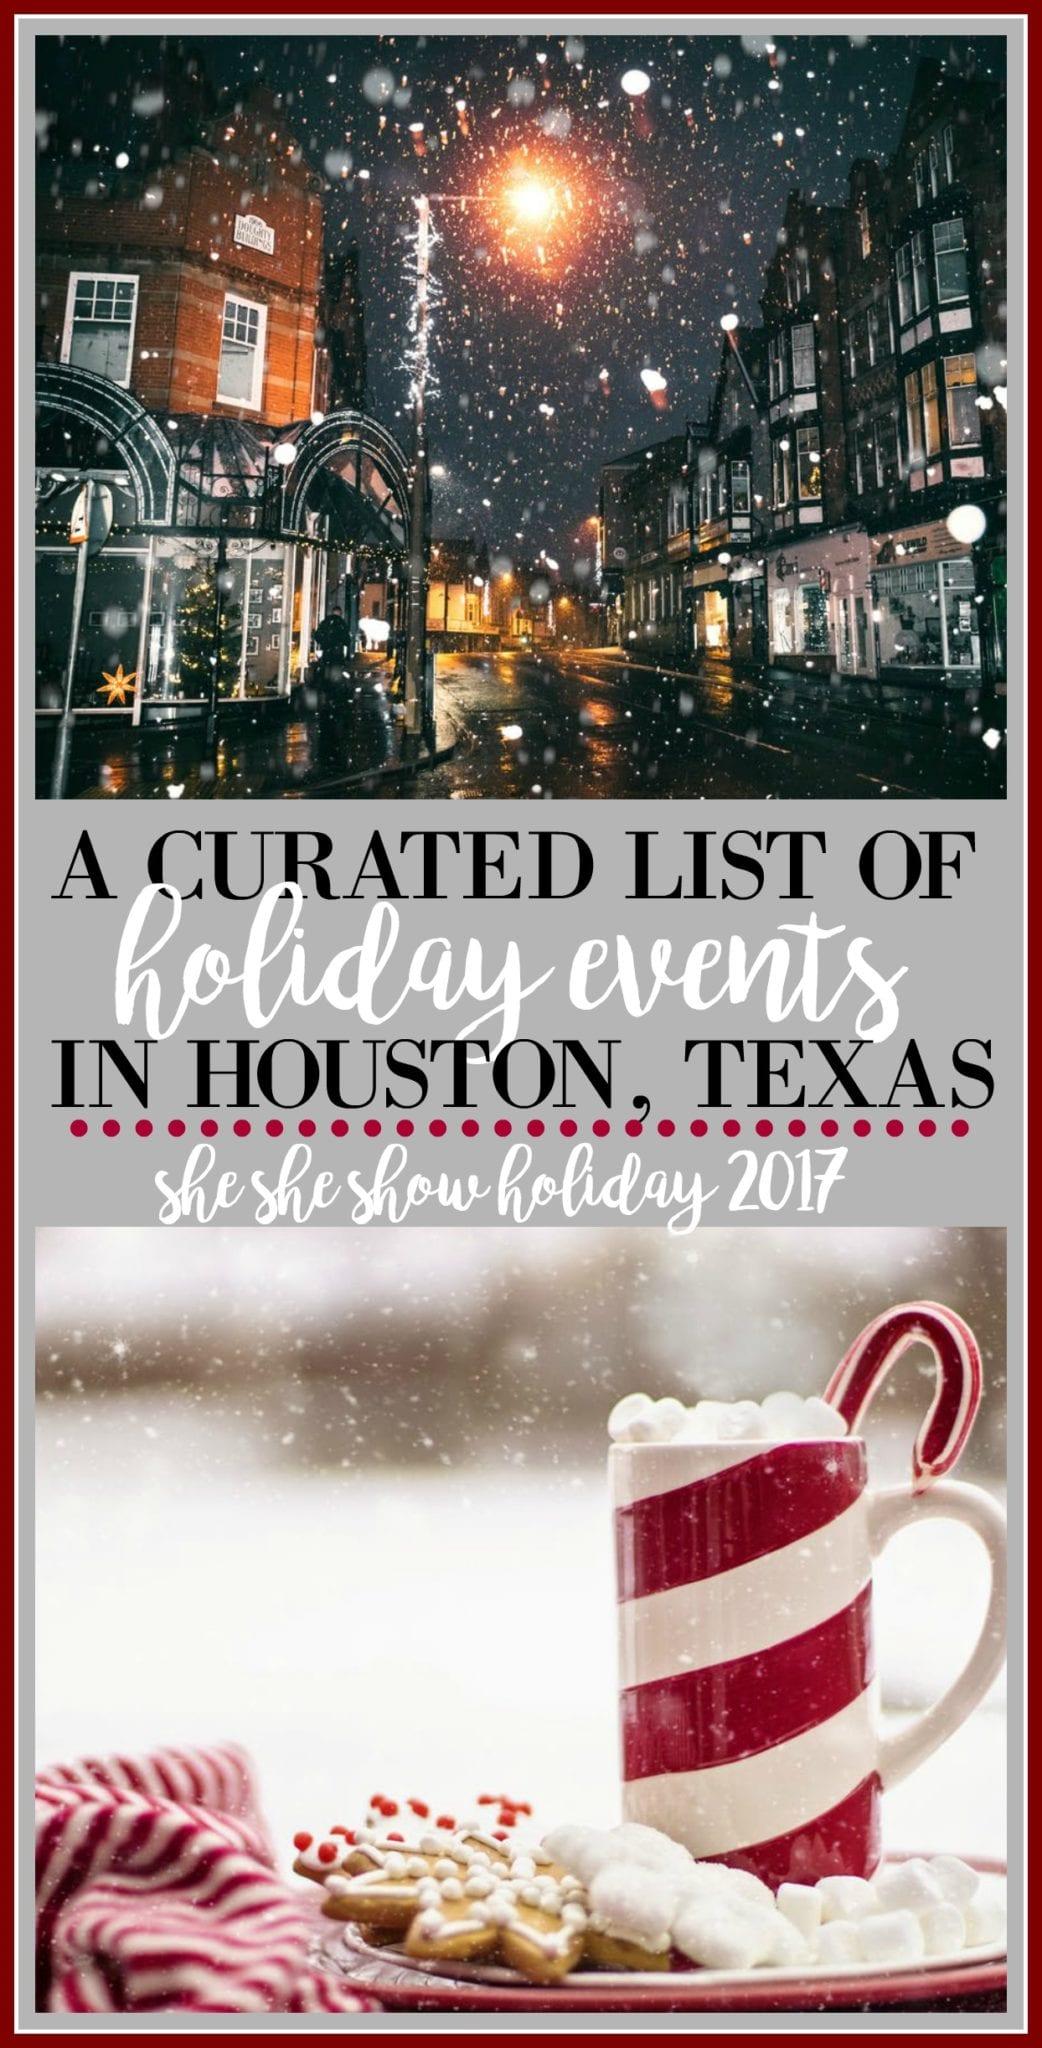 houston, christmas, holiday events, texas